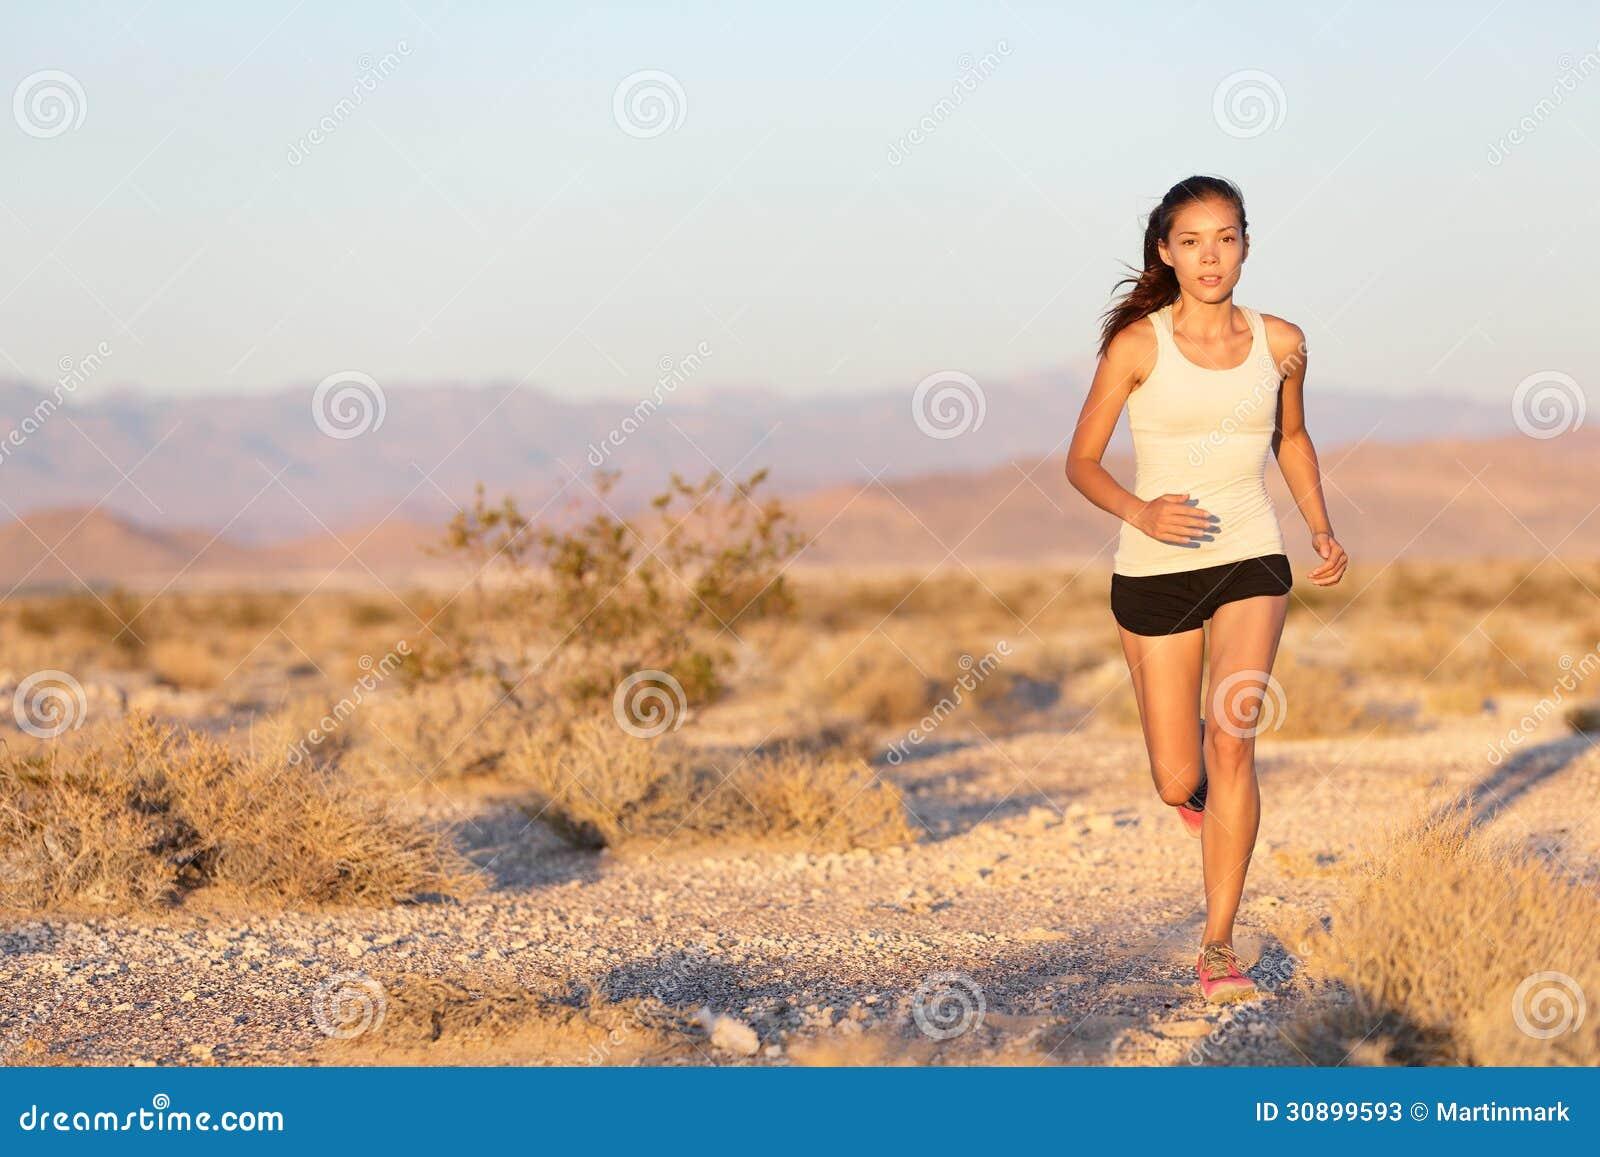 Woman Runner Running Cross Country Trail Run Stock Image - Image of  background, full: 30899593